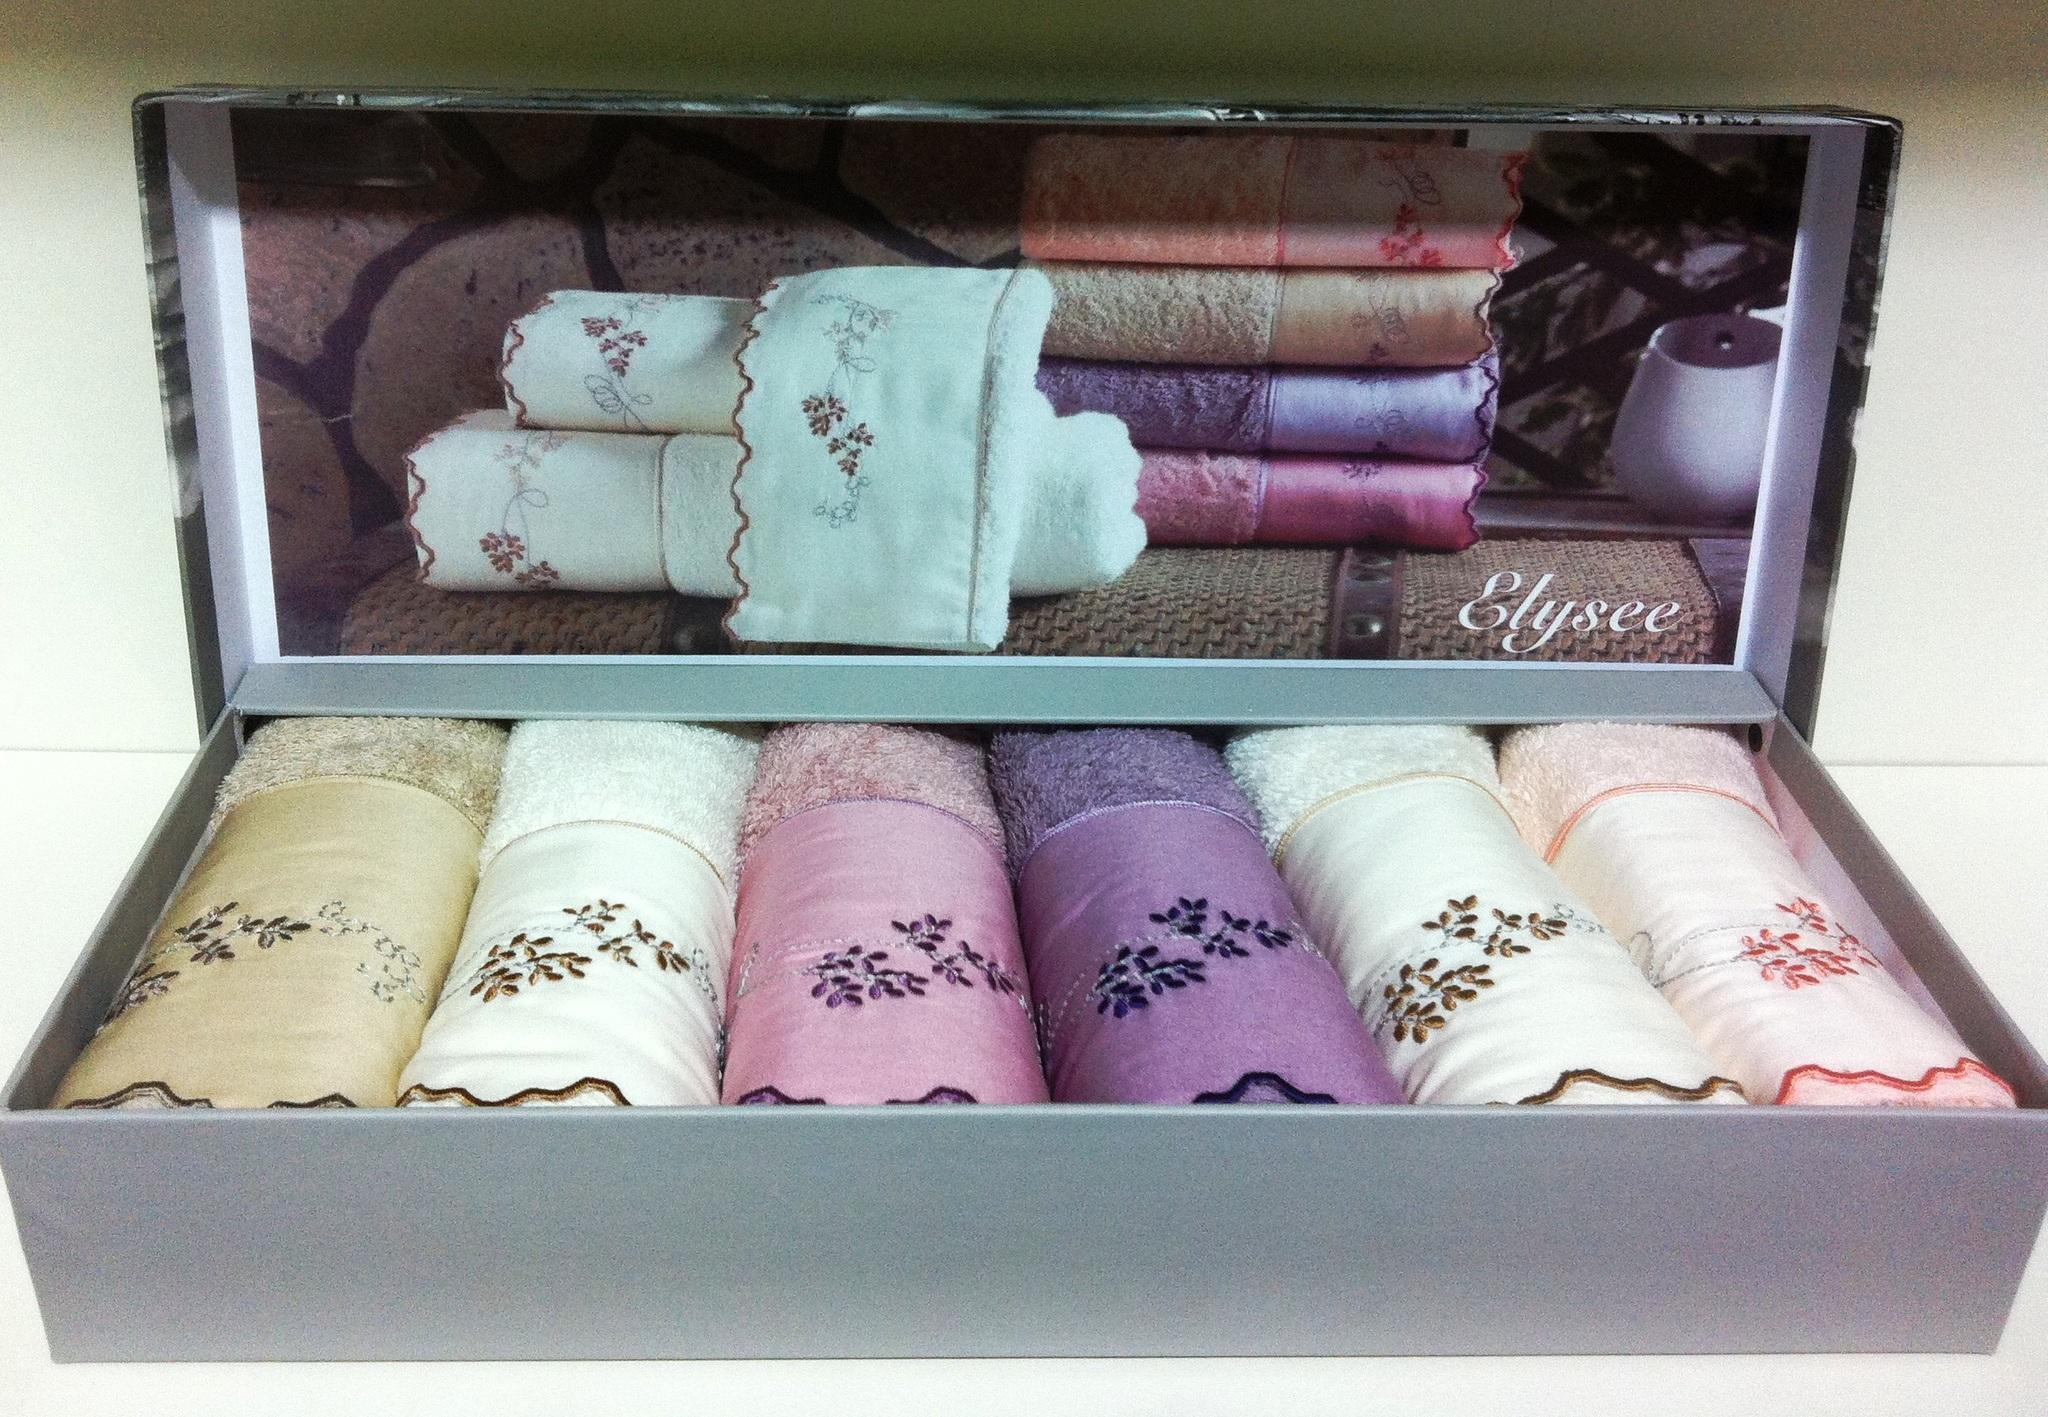 Наборы салфеток Набор полотенец  ELISSY  ЭЛИСИ в размере 30Х50  Maison Dor Турция ELYSEE__2_.JPG